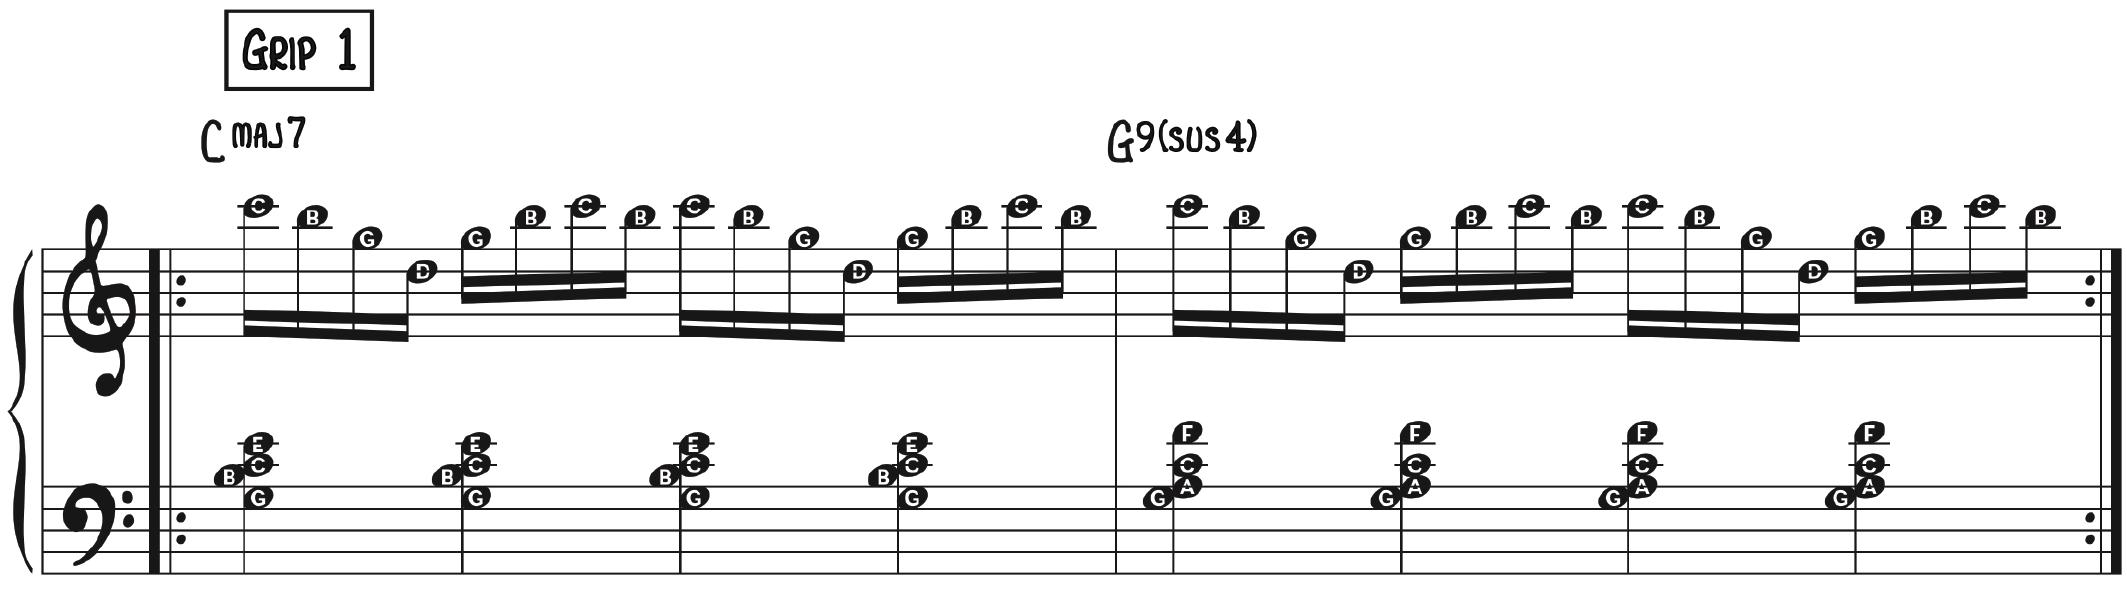 16th Note Exercise–Grip 1 contemporary piano improv technique